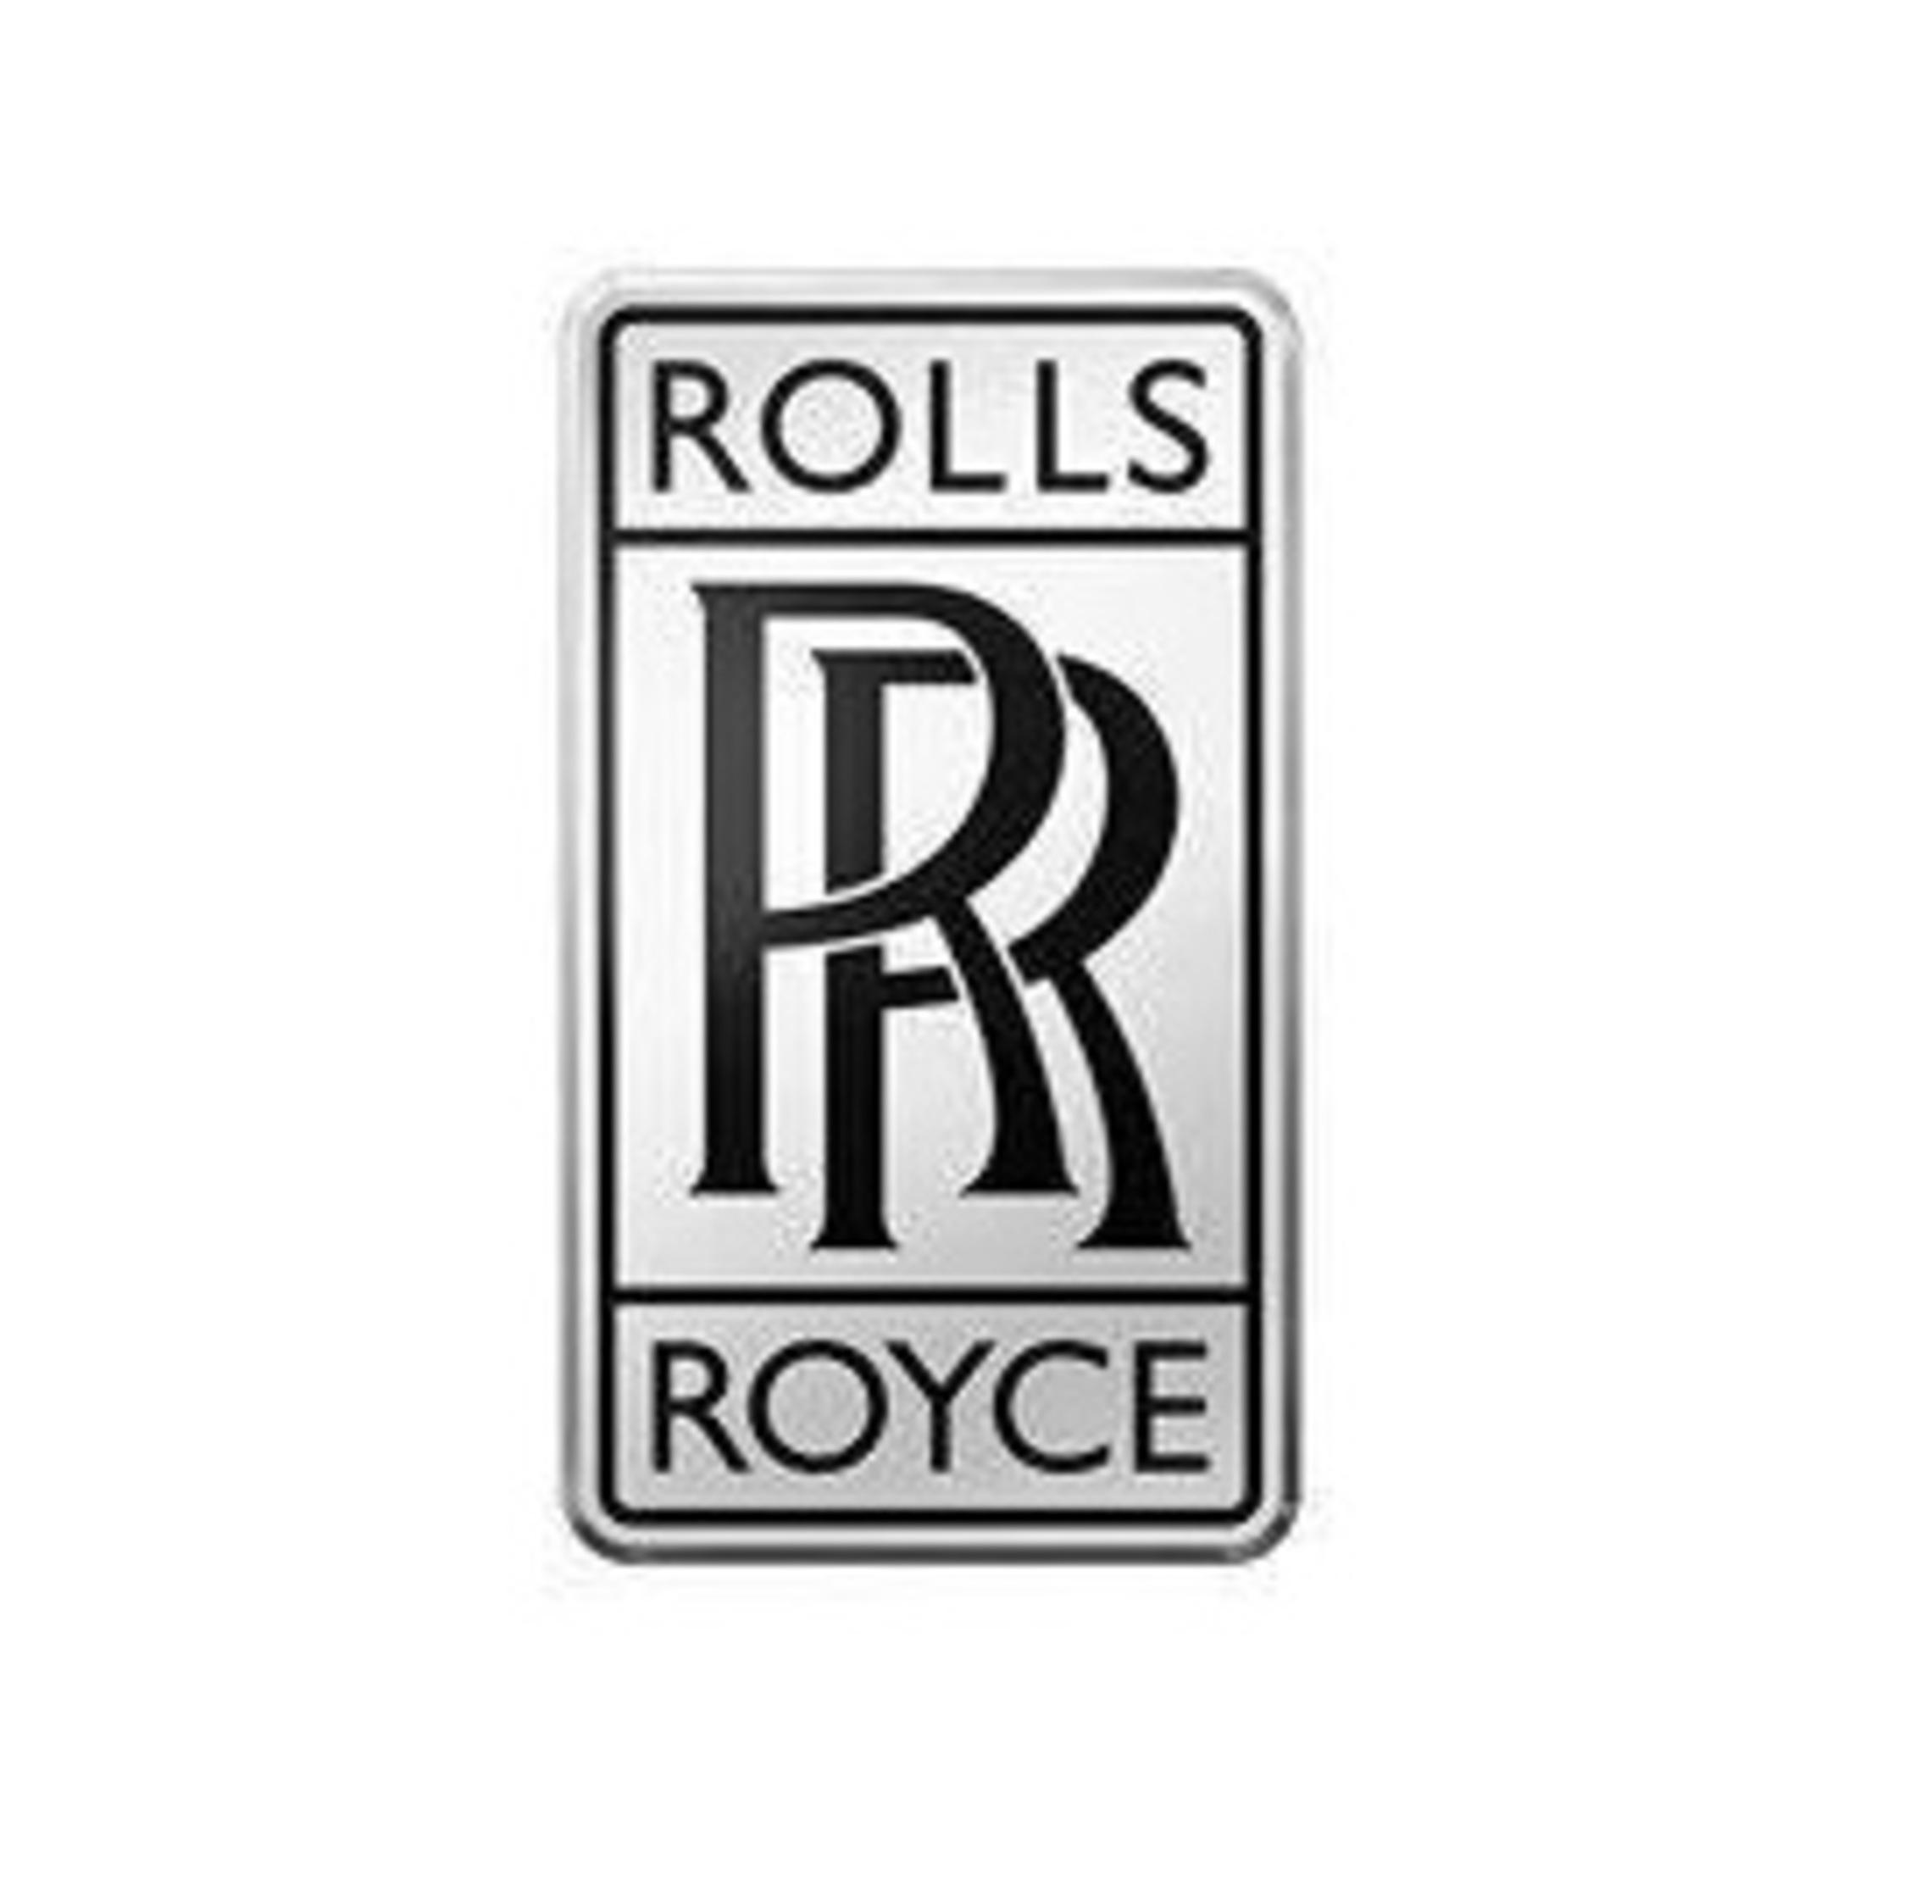 rolls royce motor- company logo